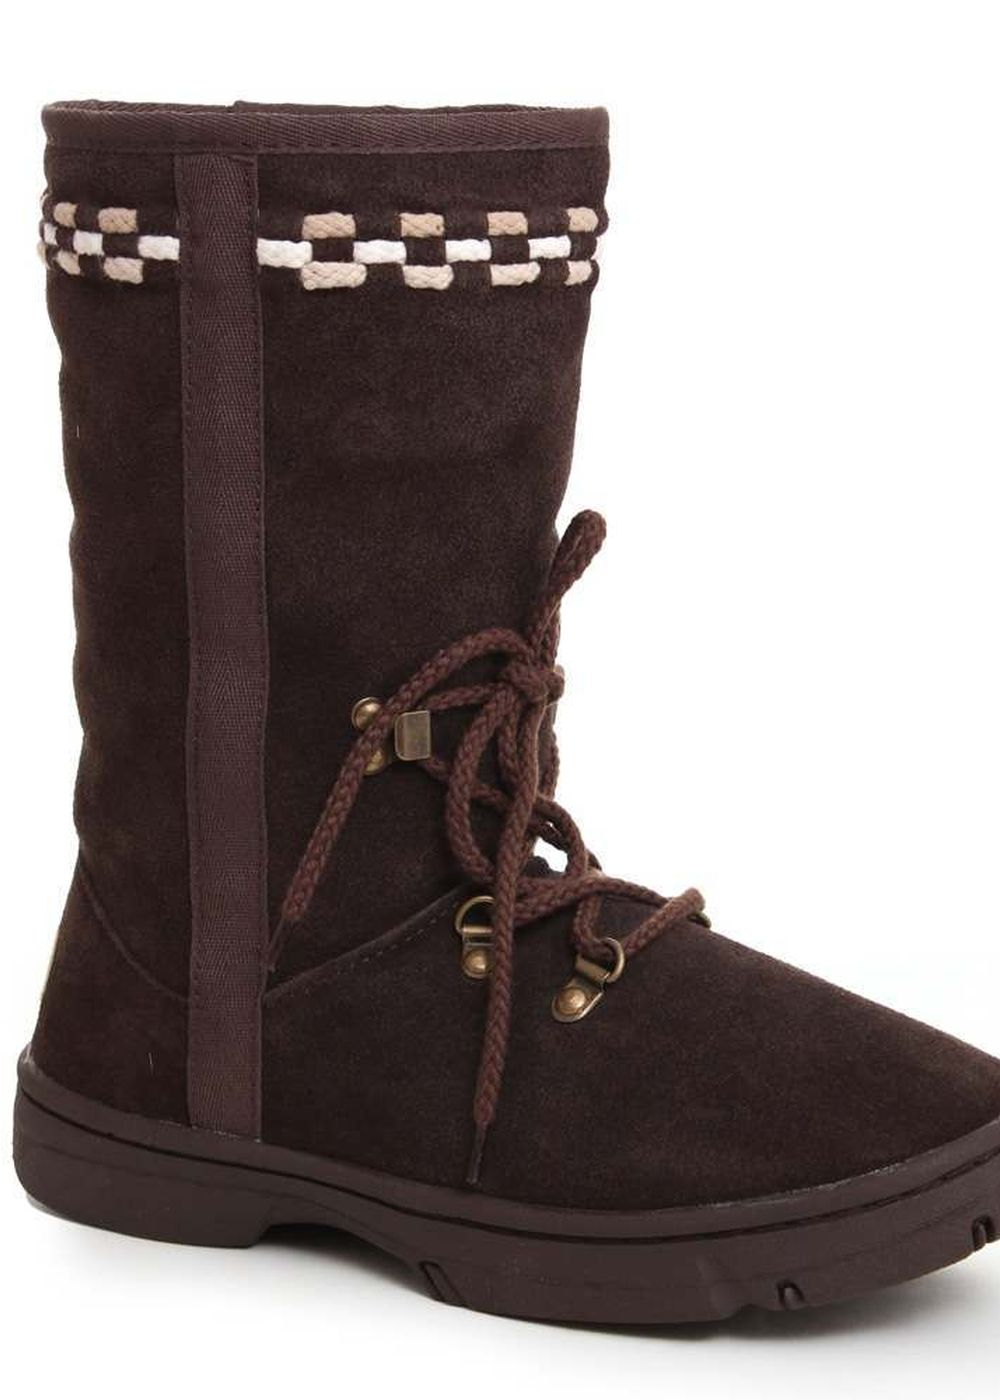 roxy-tamara-leather-snow-boot-hazel-brown